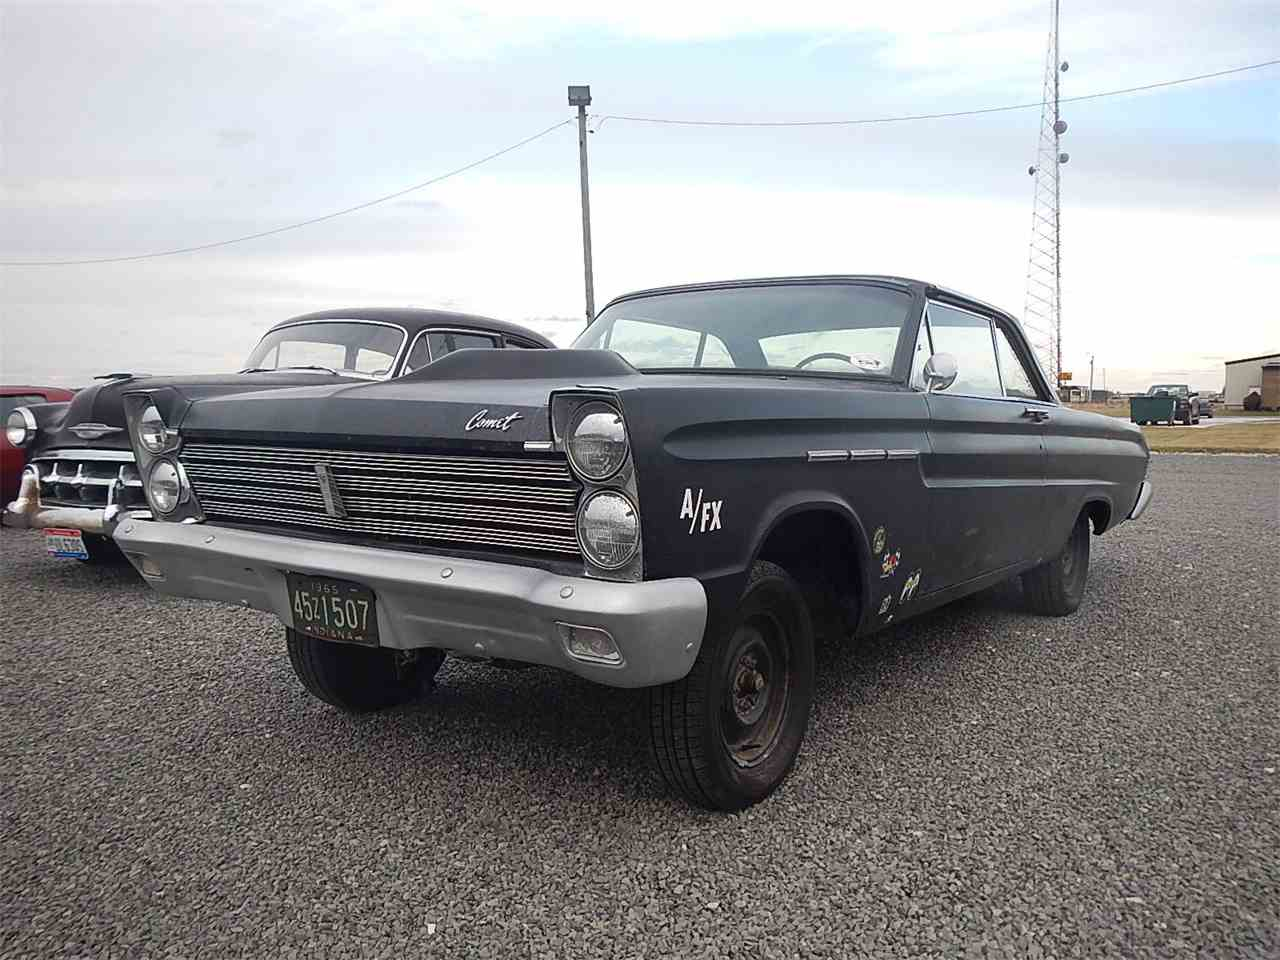 1965 Mercury Comet for Sale | ClassicCars.com | CC-1044293